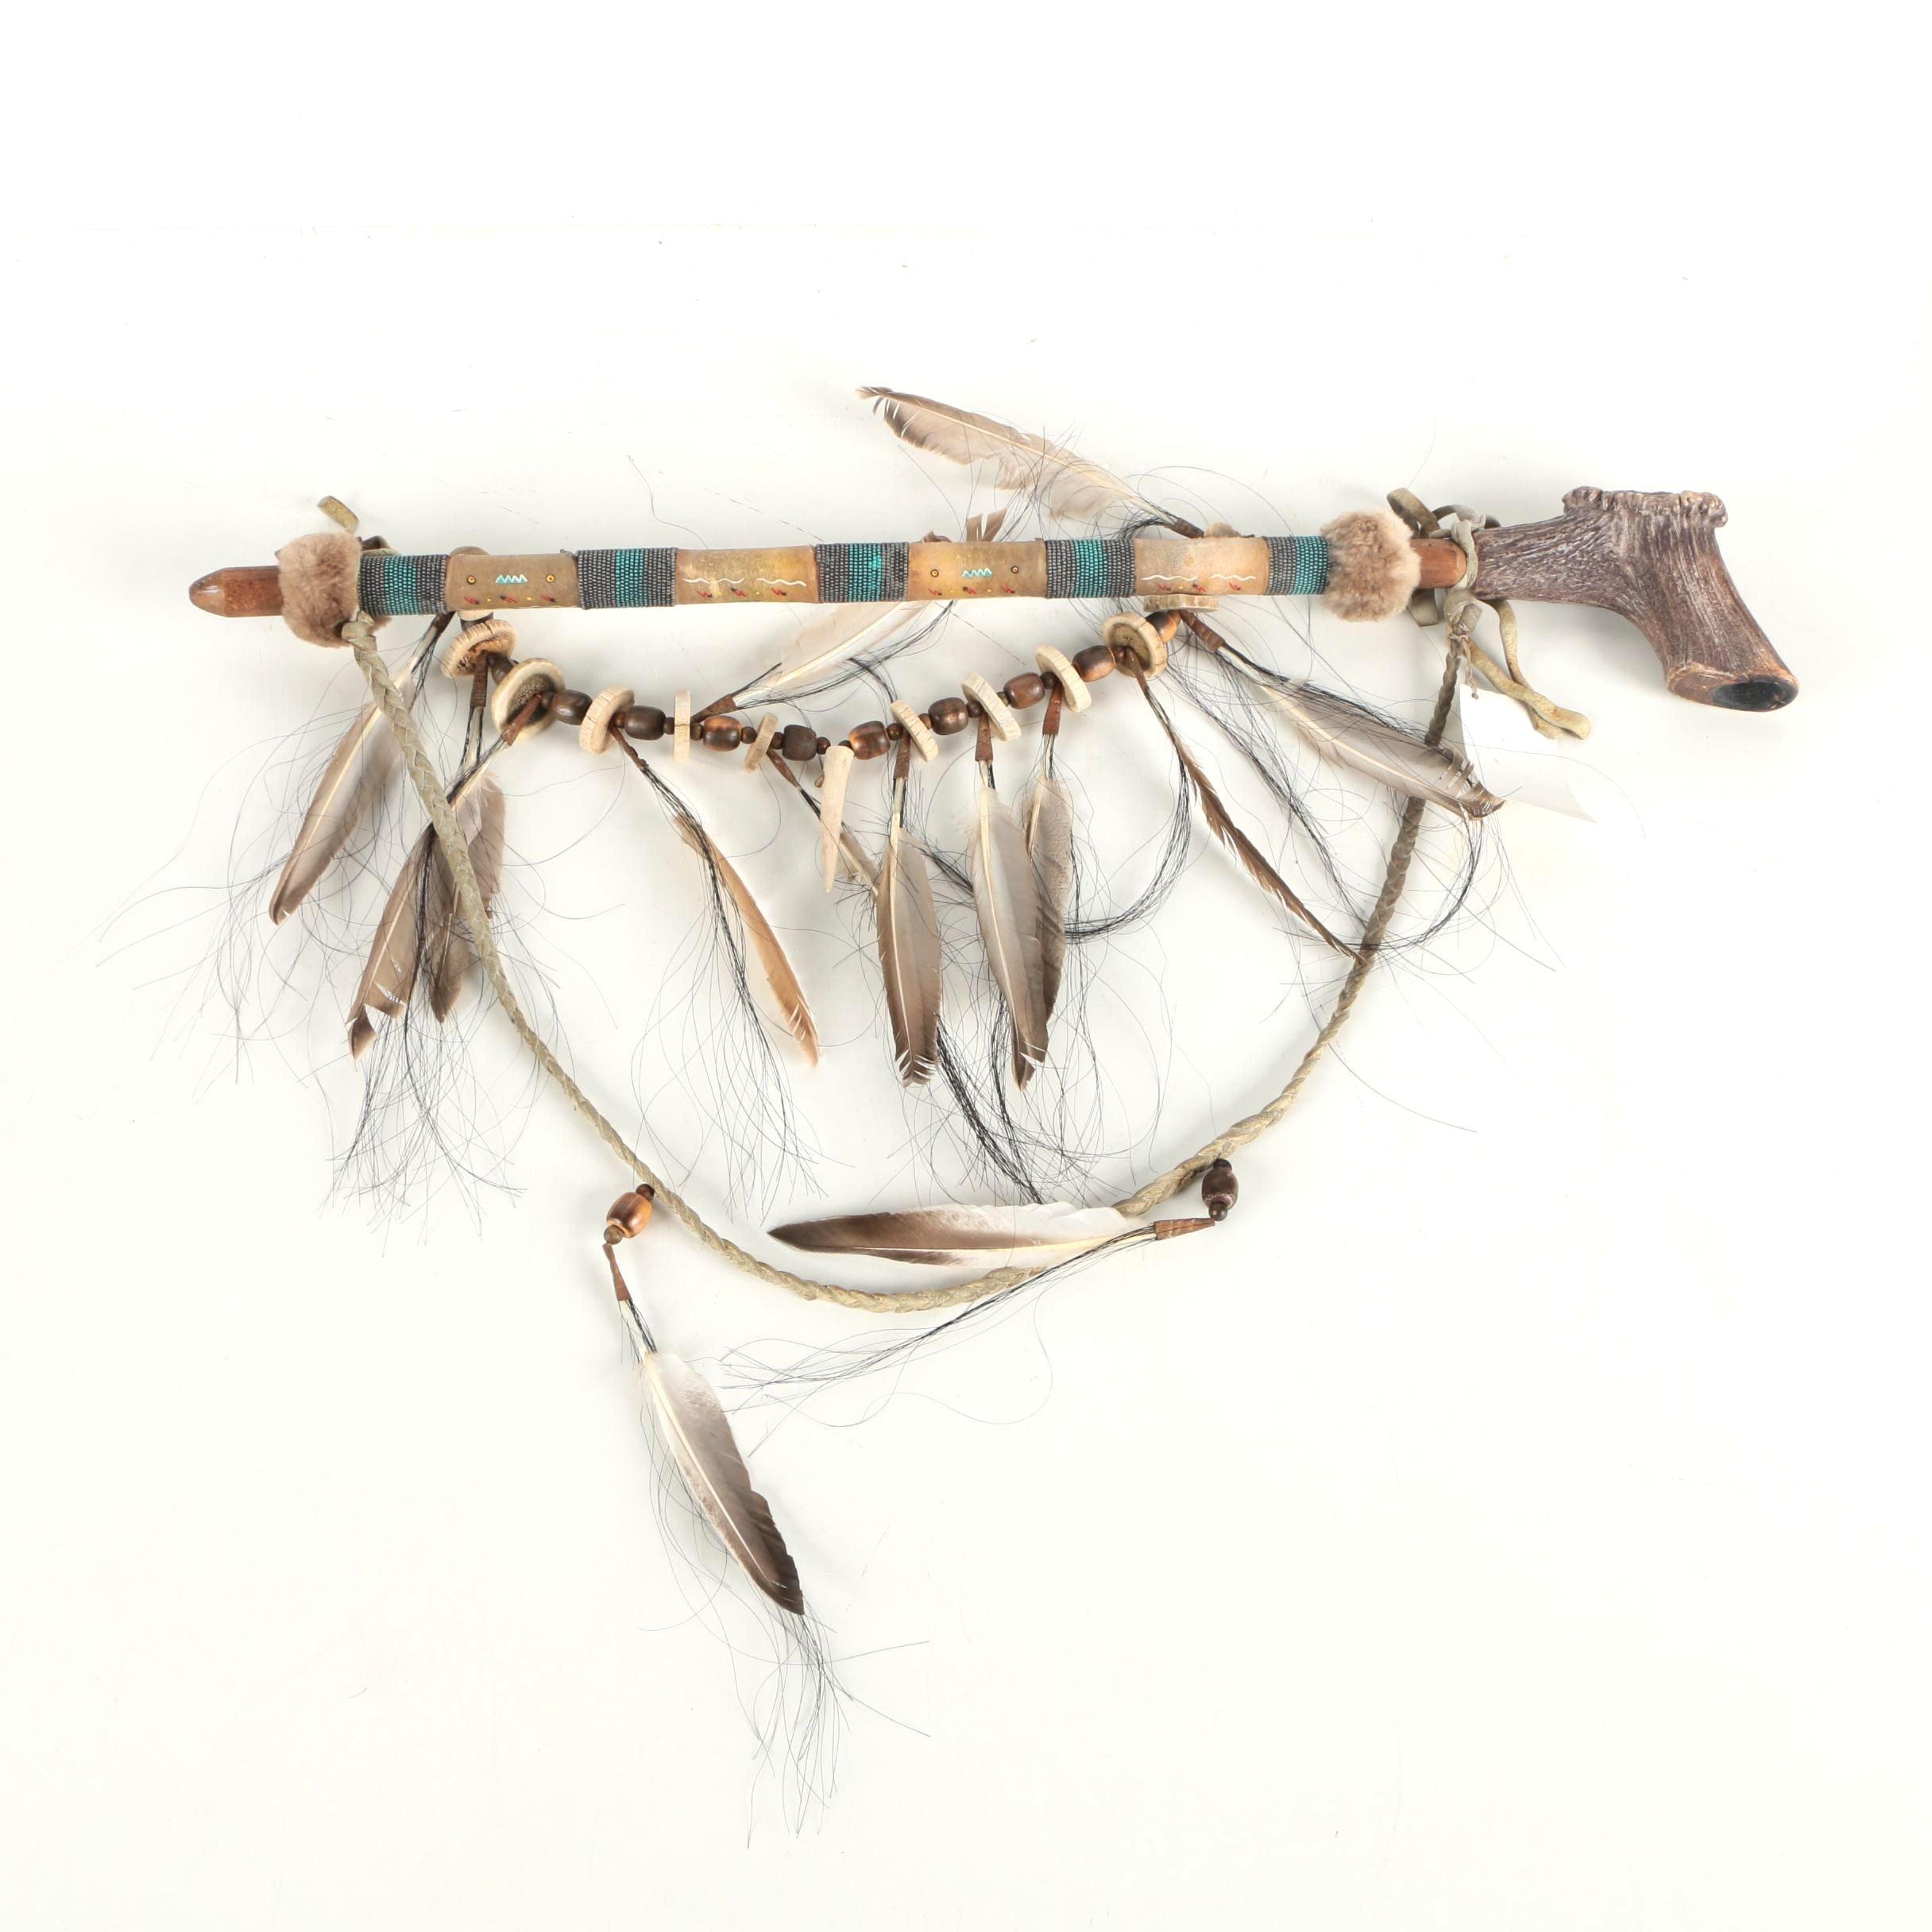 Native American Inspired Antler Pipe